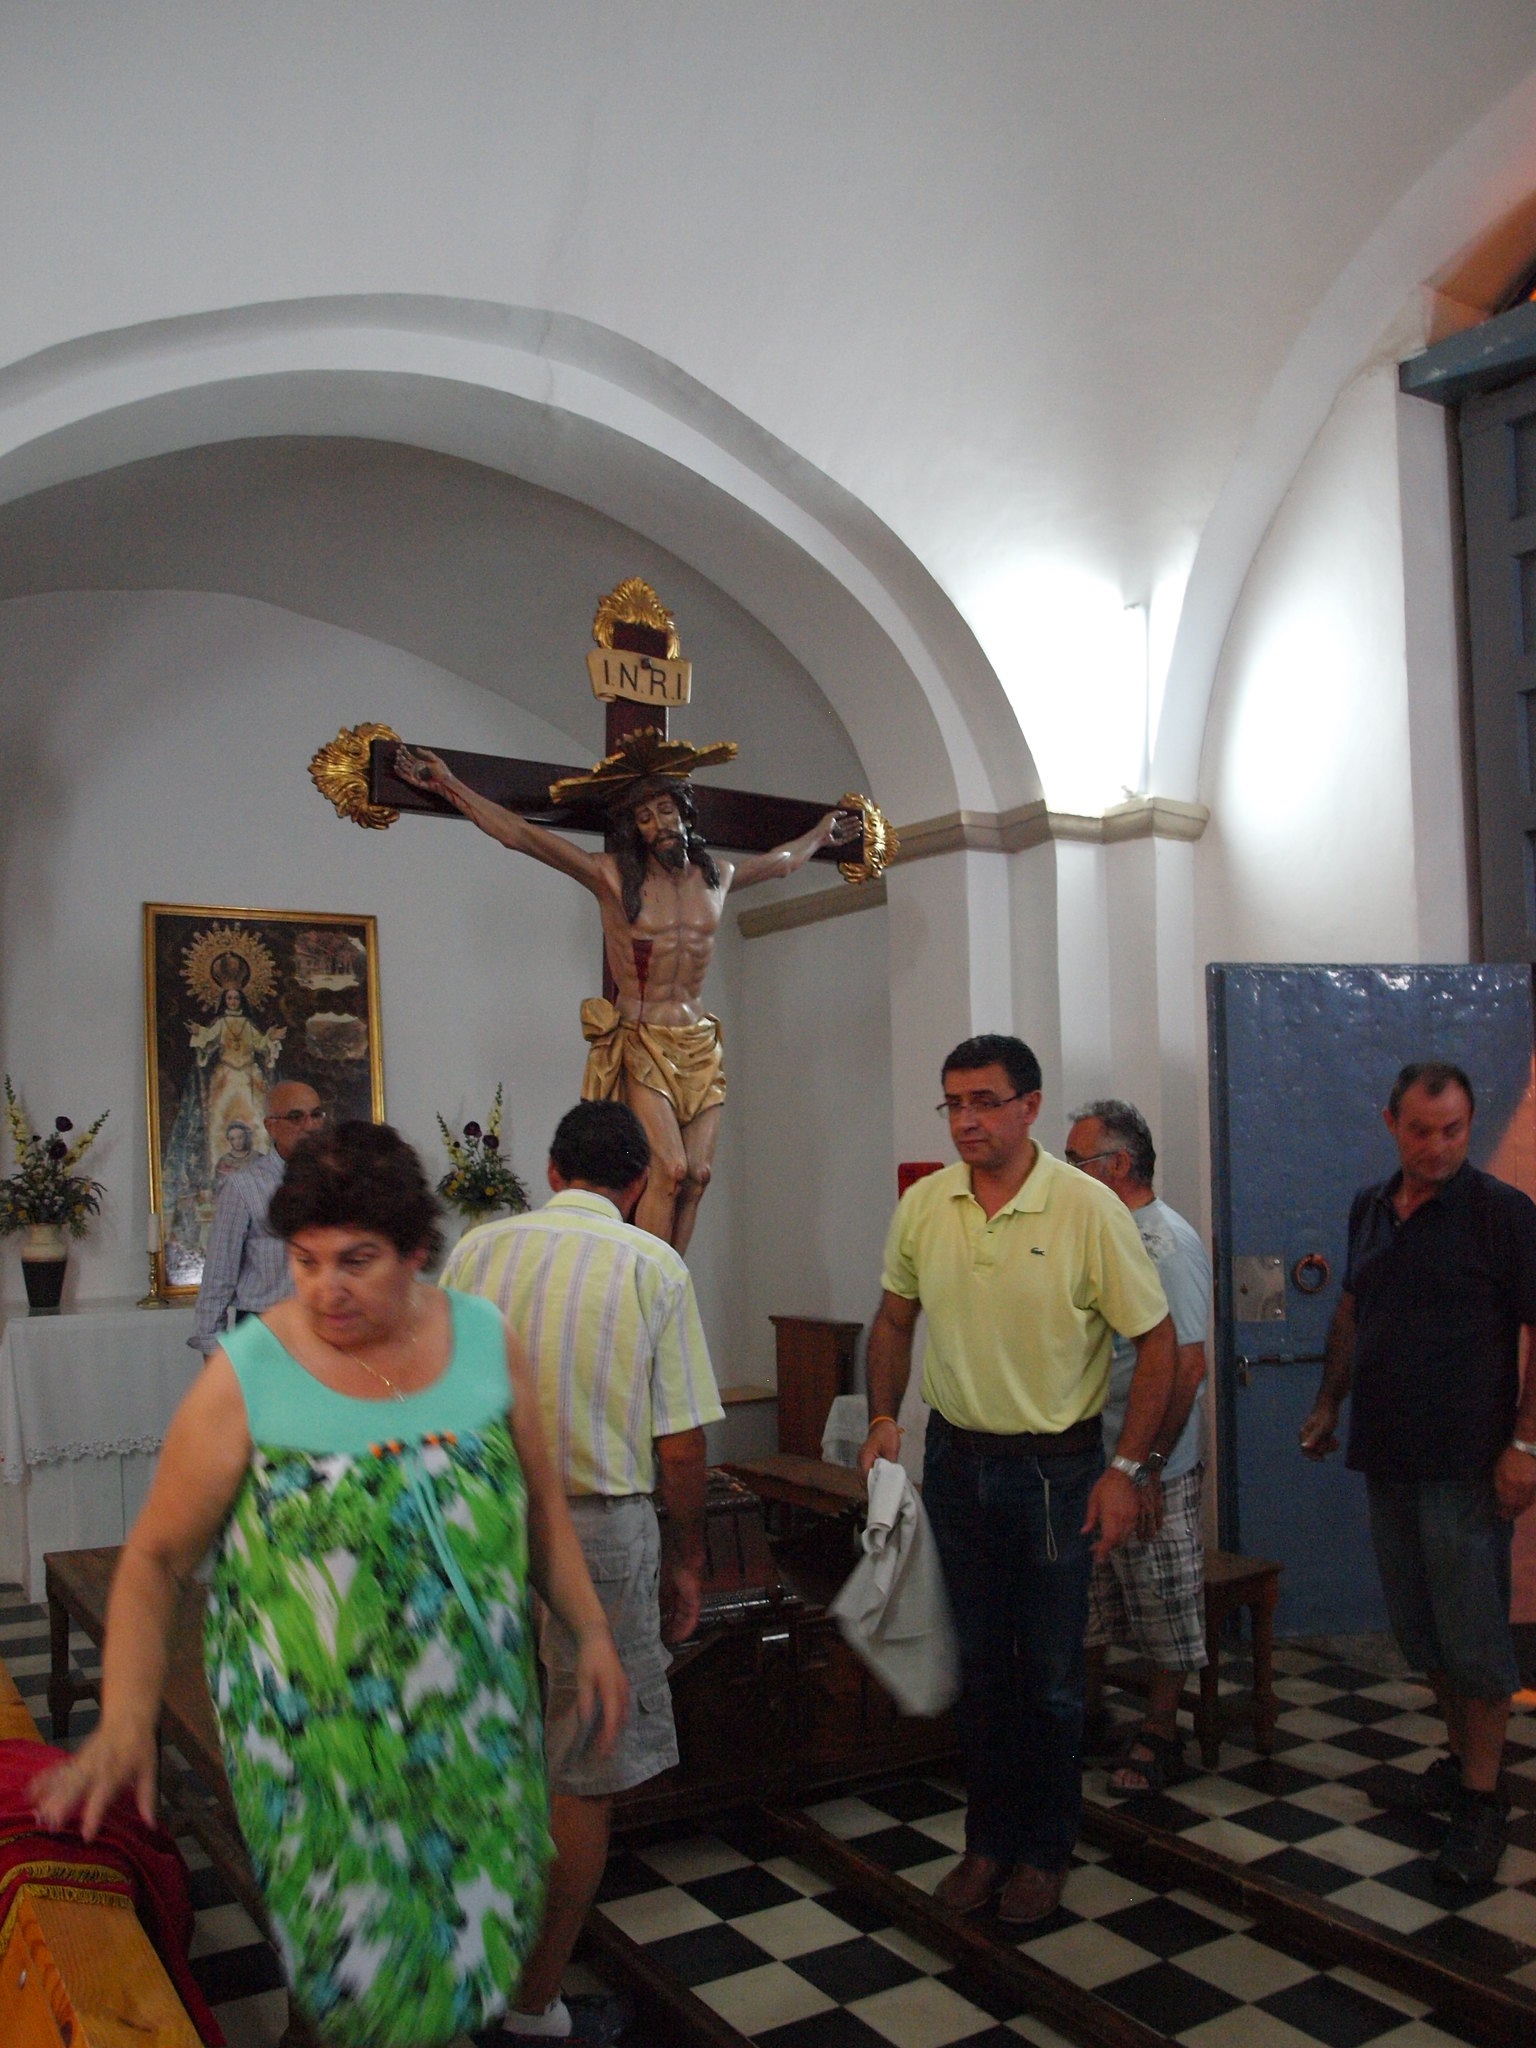 (2014-07-07) - Recogida de Imagen - Paloma Romero Torralba (28)